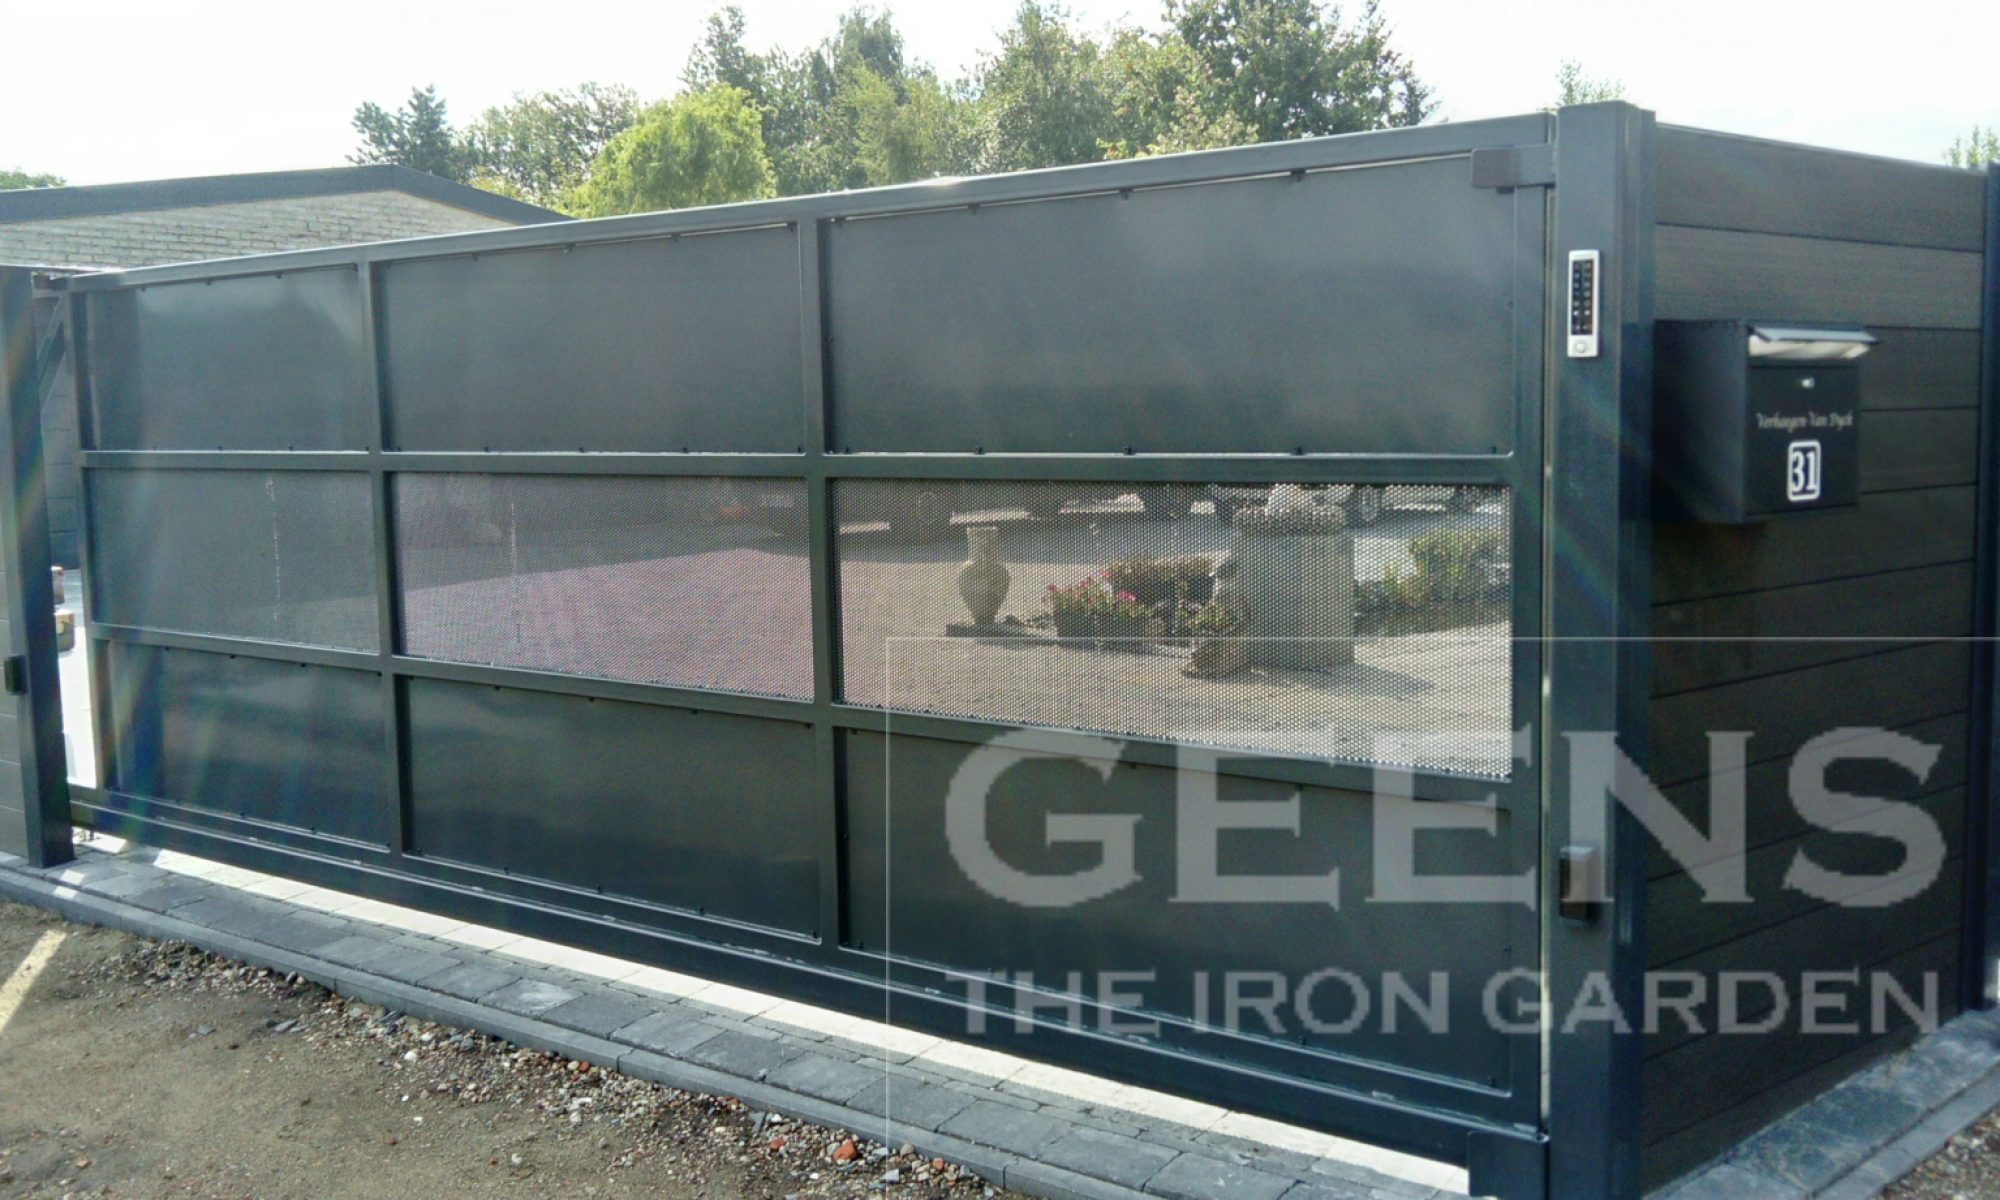 Geens - The Iron Garden